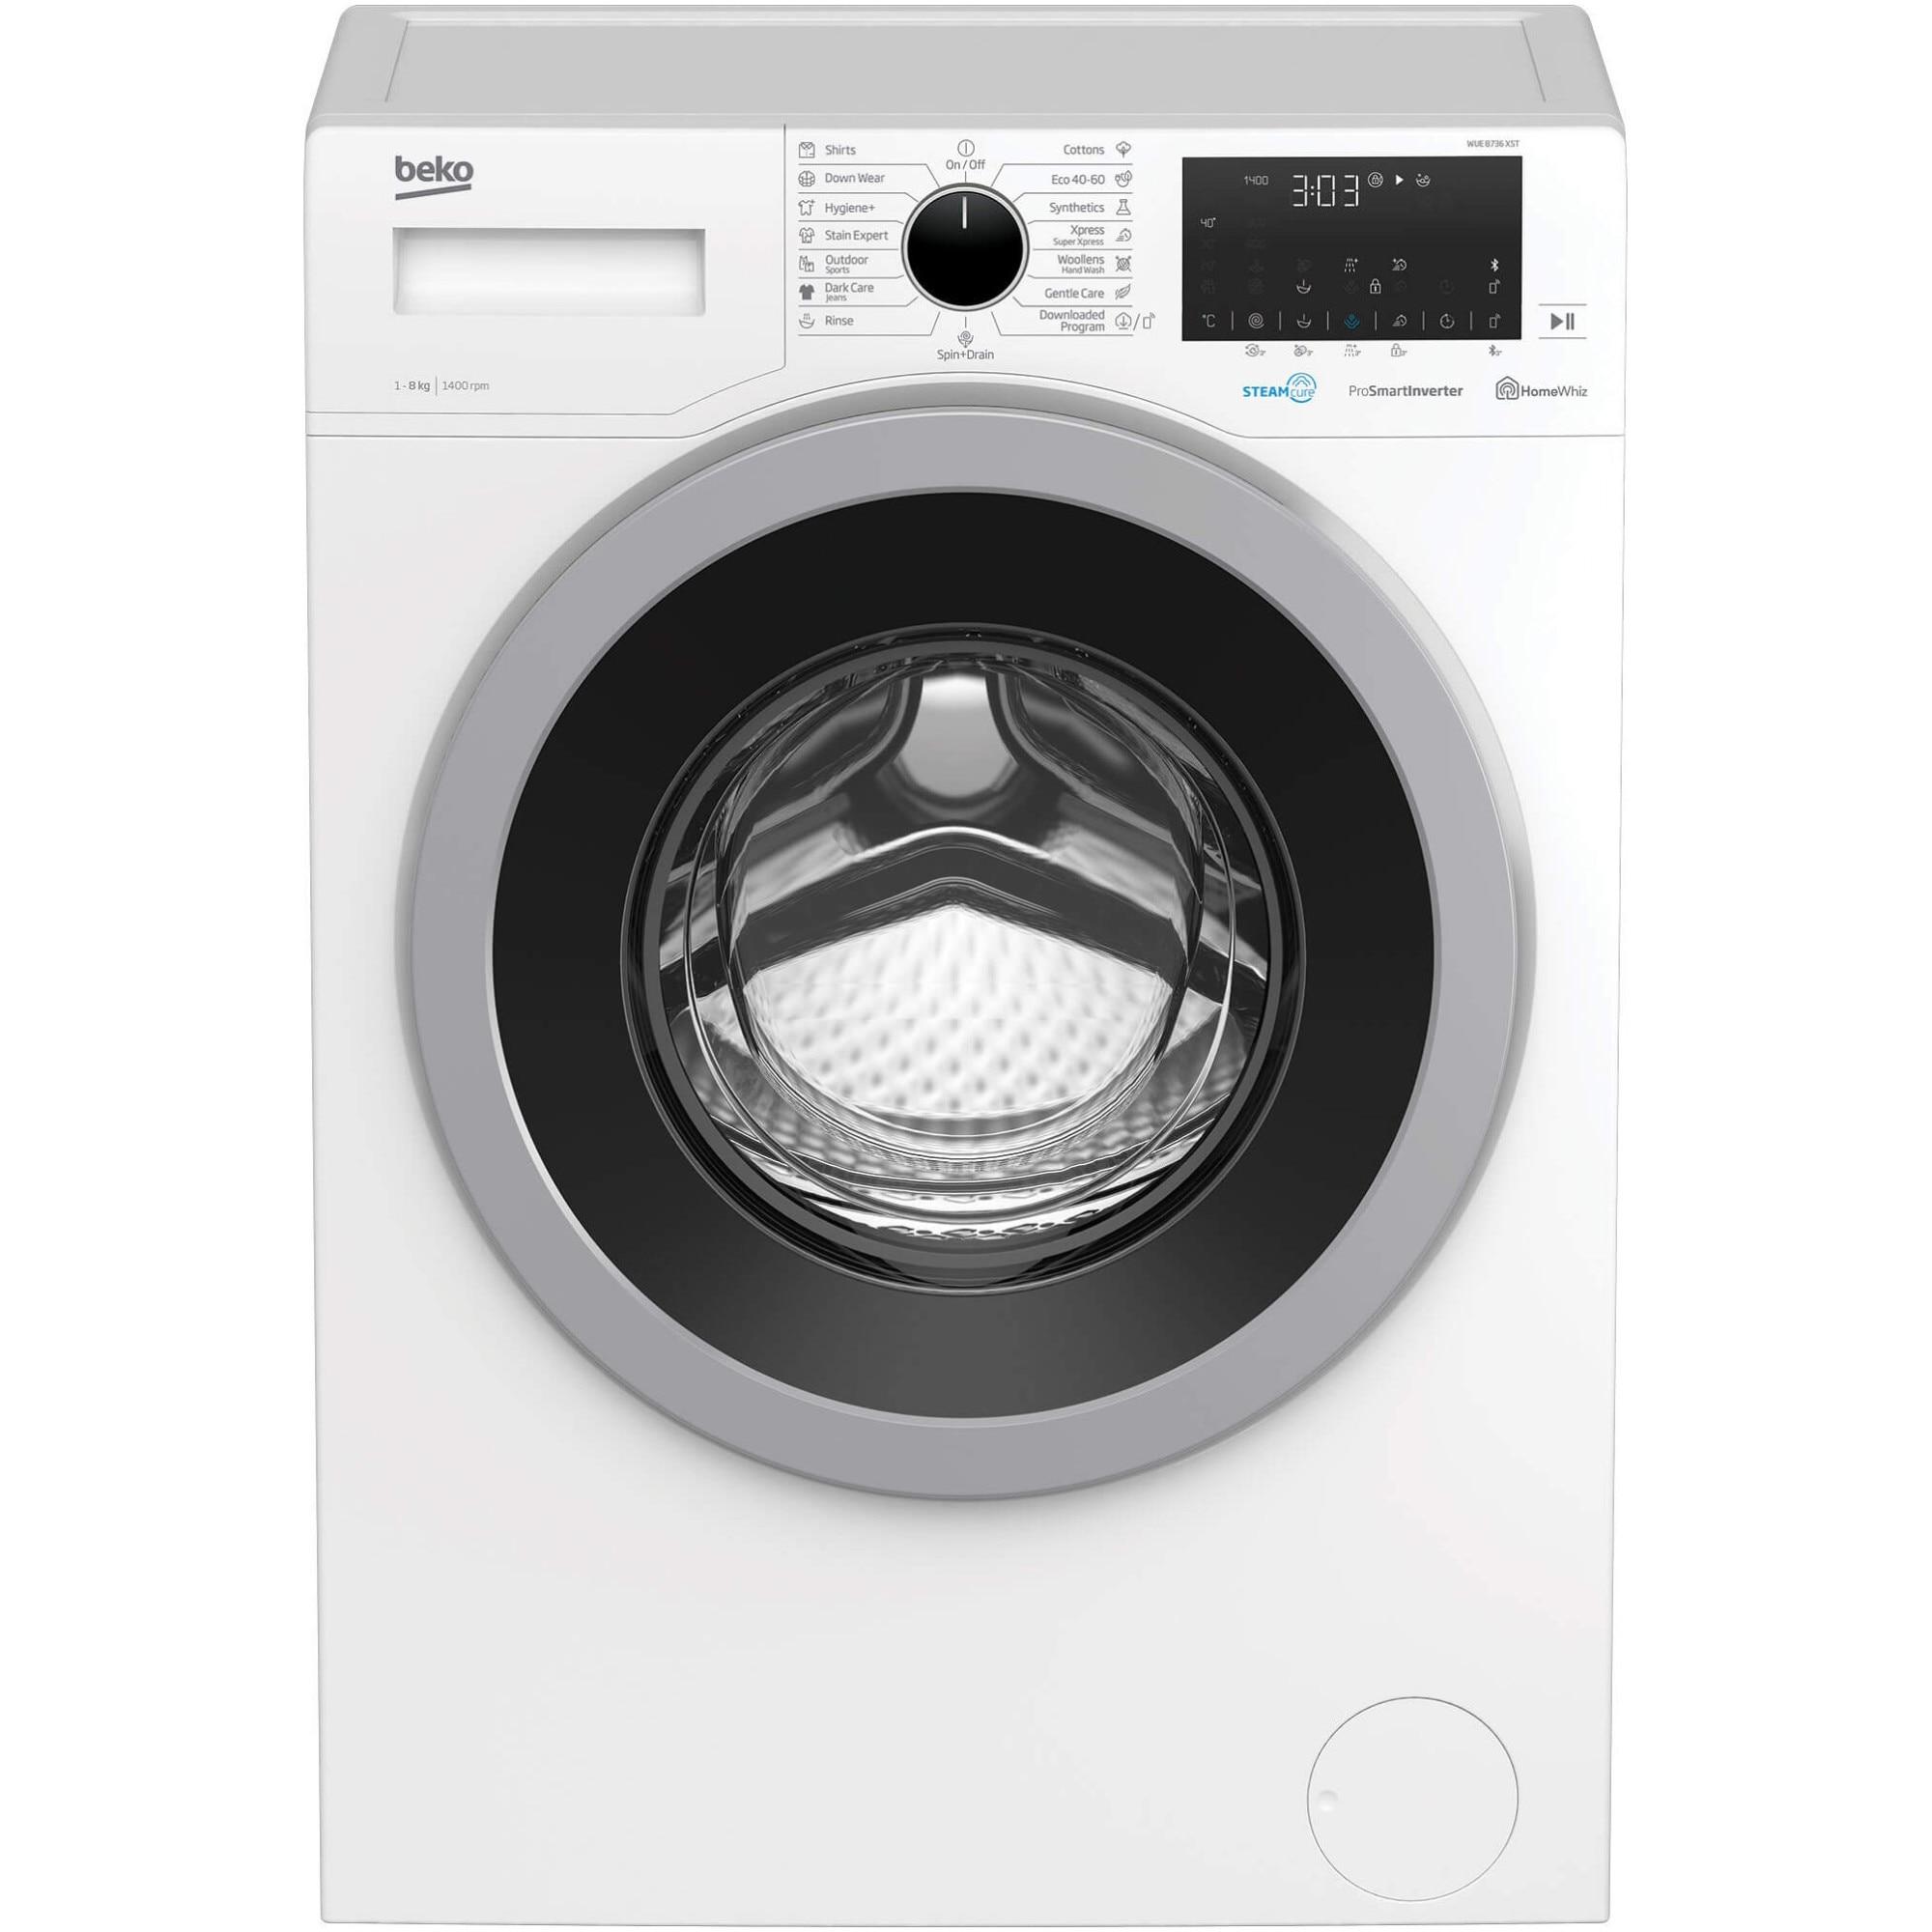 Fotografie Masina de spalat rufe Beko WUE8736XST, 8 kg, Clasa C, 1400 RPM, HomeWhiz, Bluetooth, SteamCure, Add Garment, Motor ProSmart Inverter, Alb